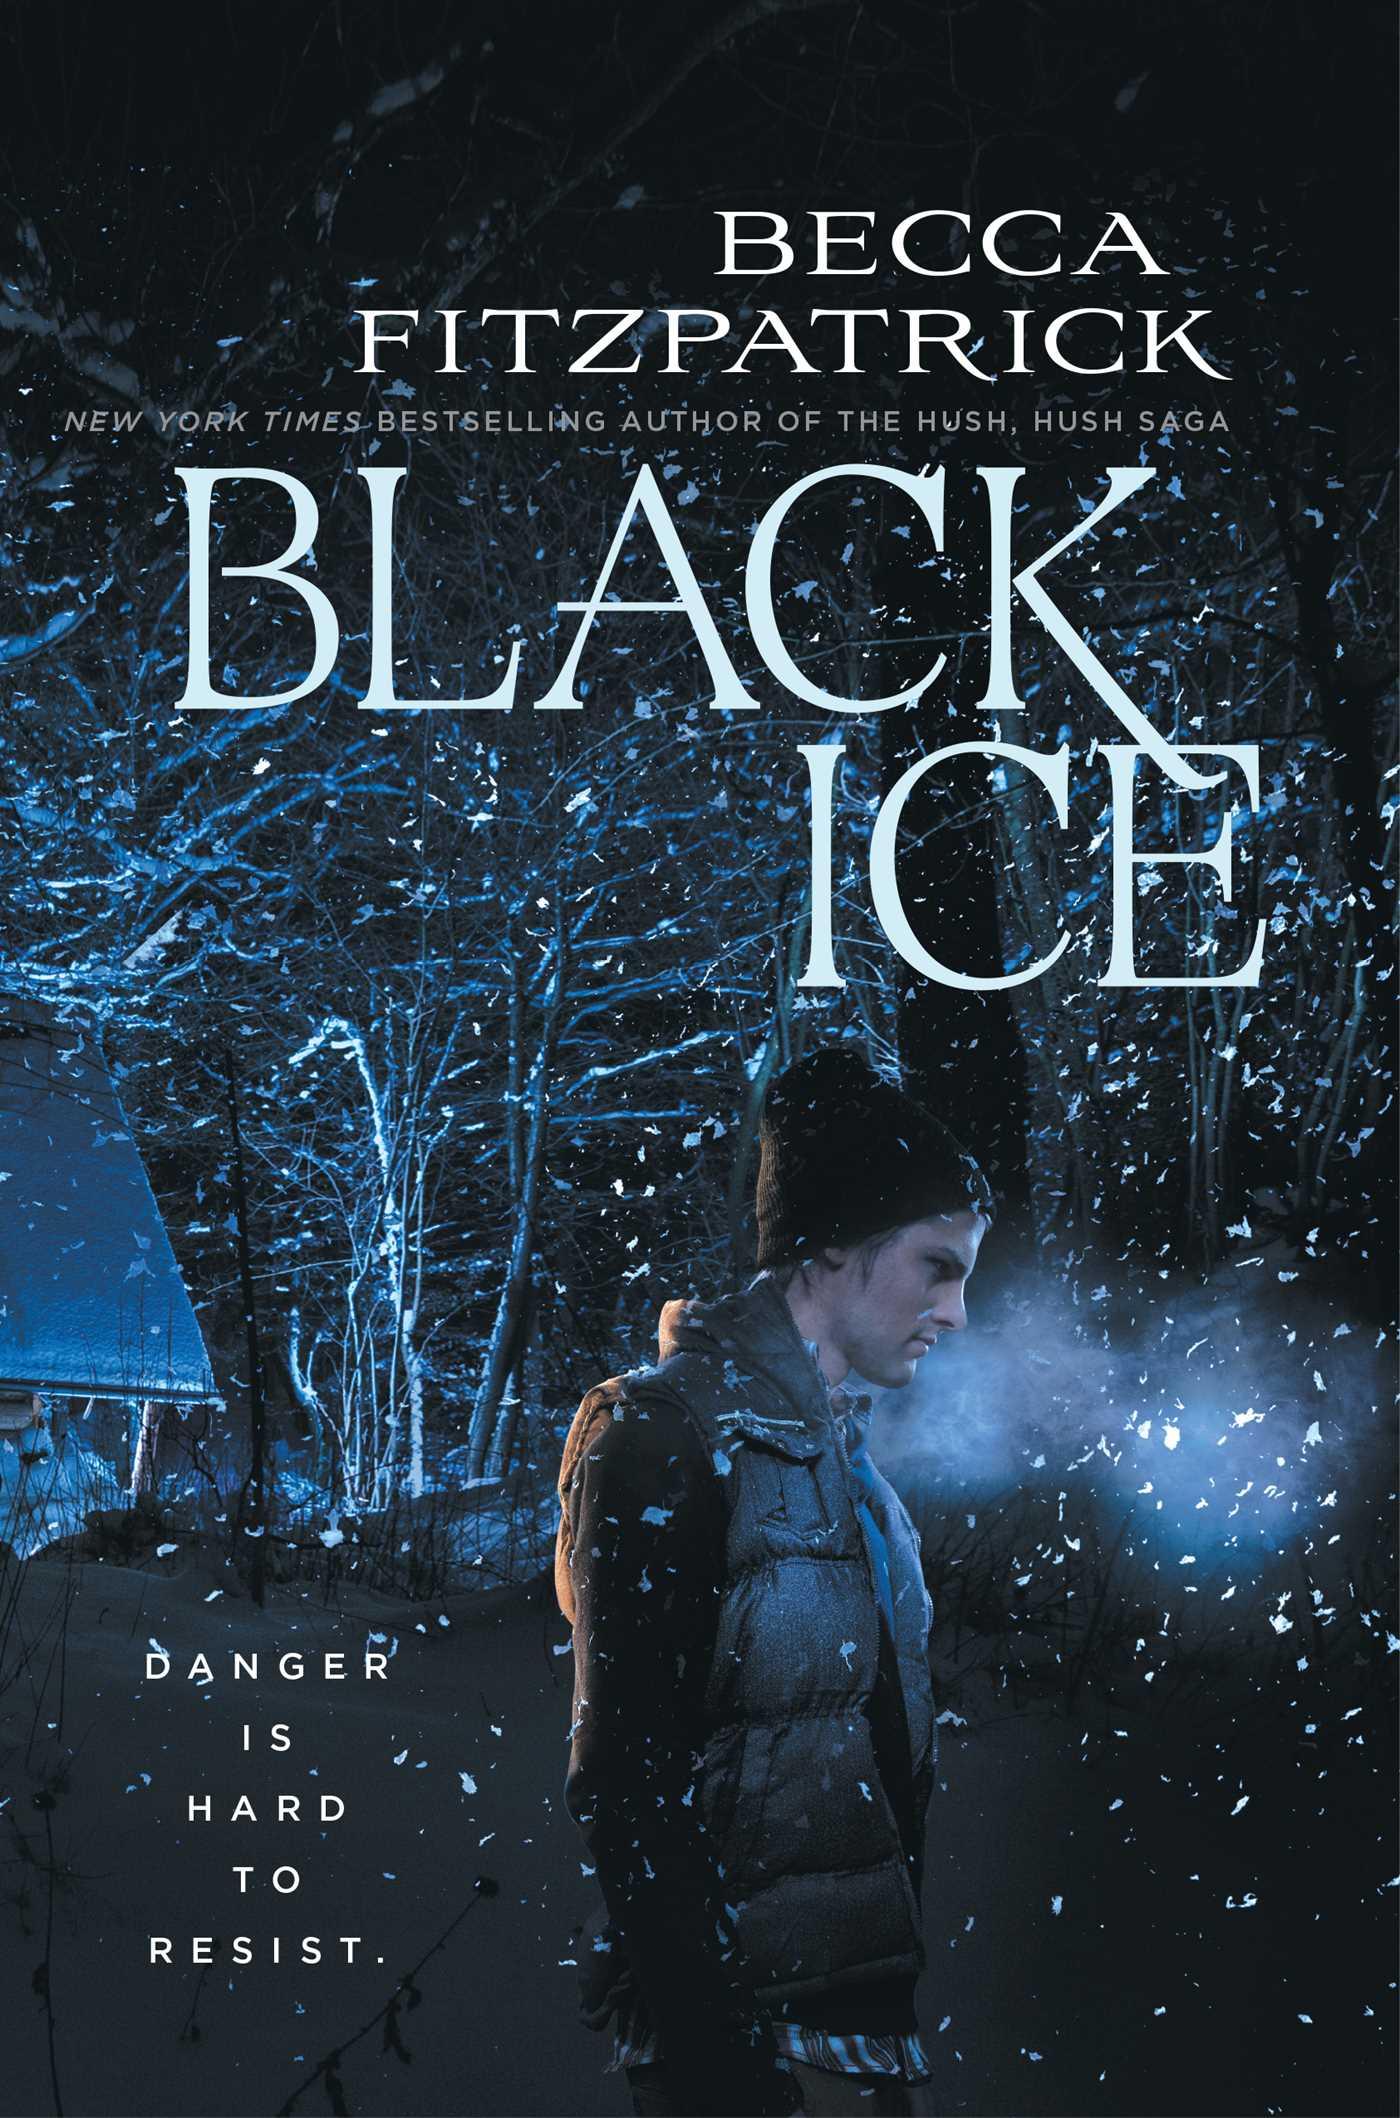 Black ice 9781442474260 hr